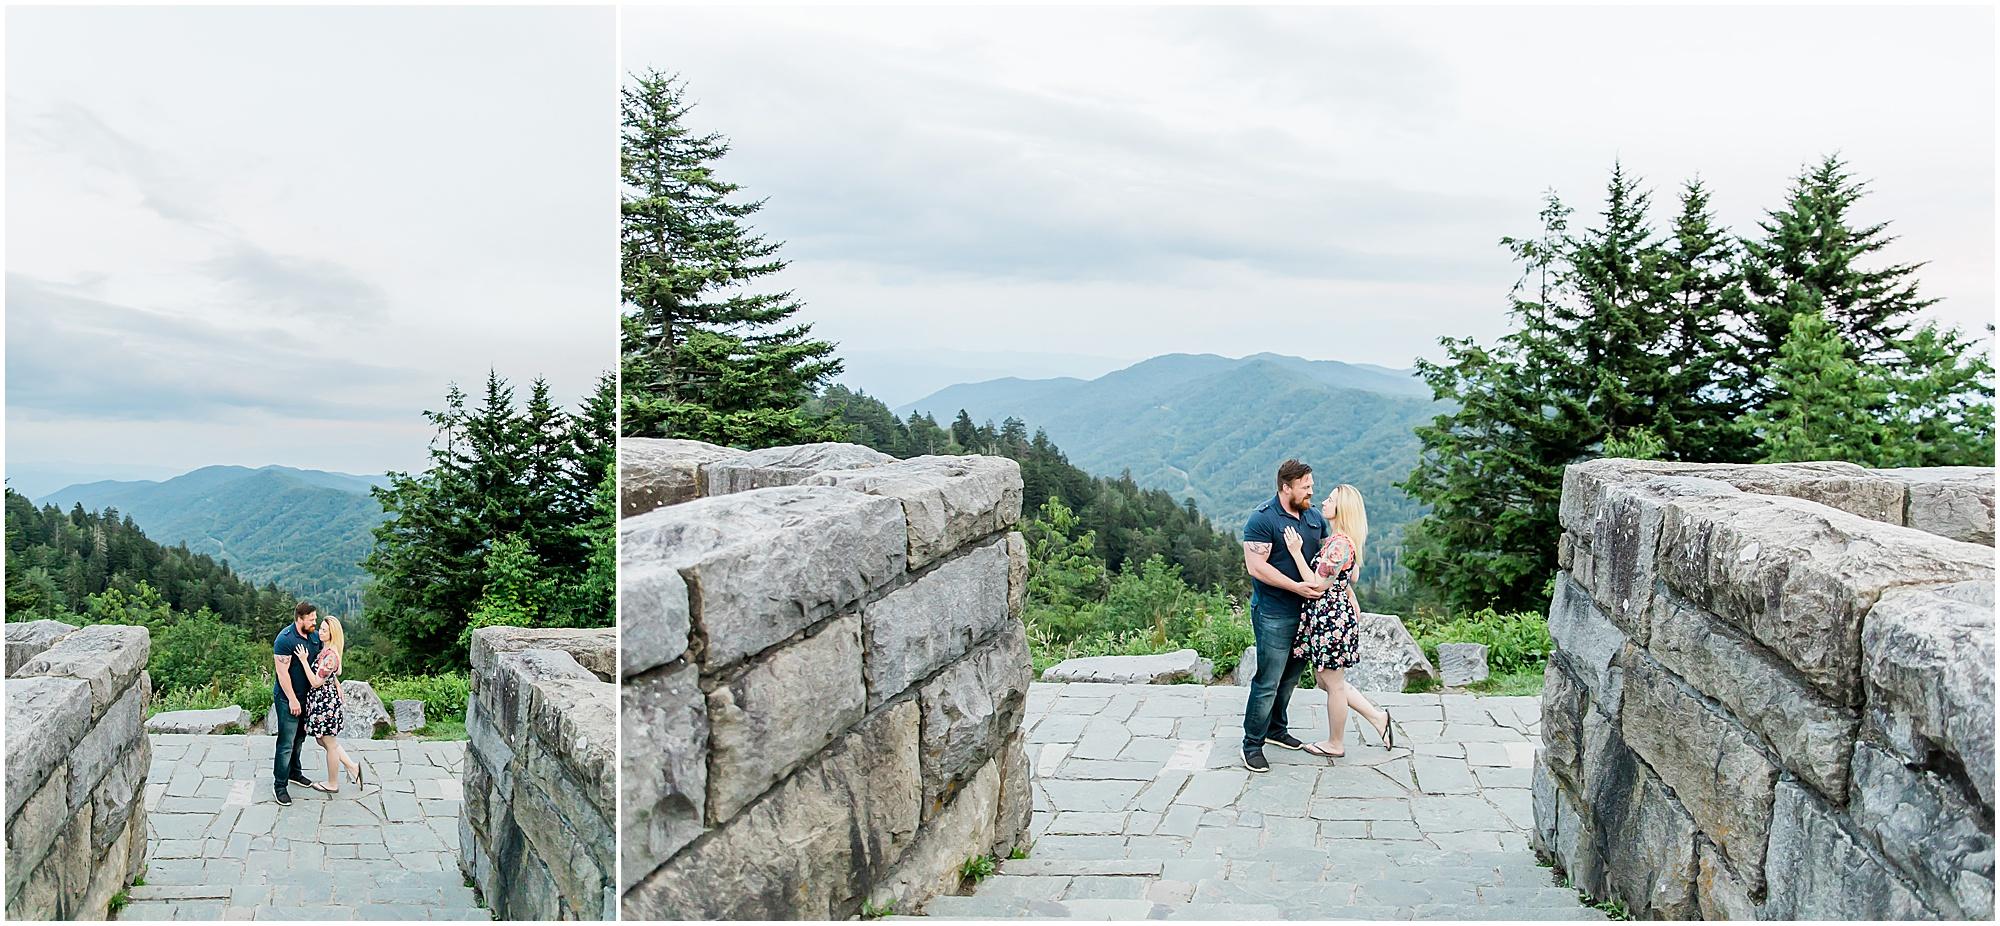 surprise proposal gatlinburg tennessee mountain engagement hiking new adventure productions_0134.jpg